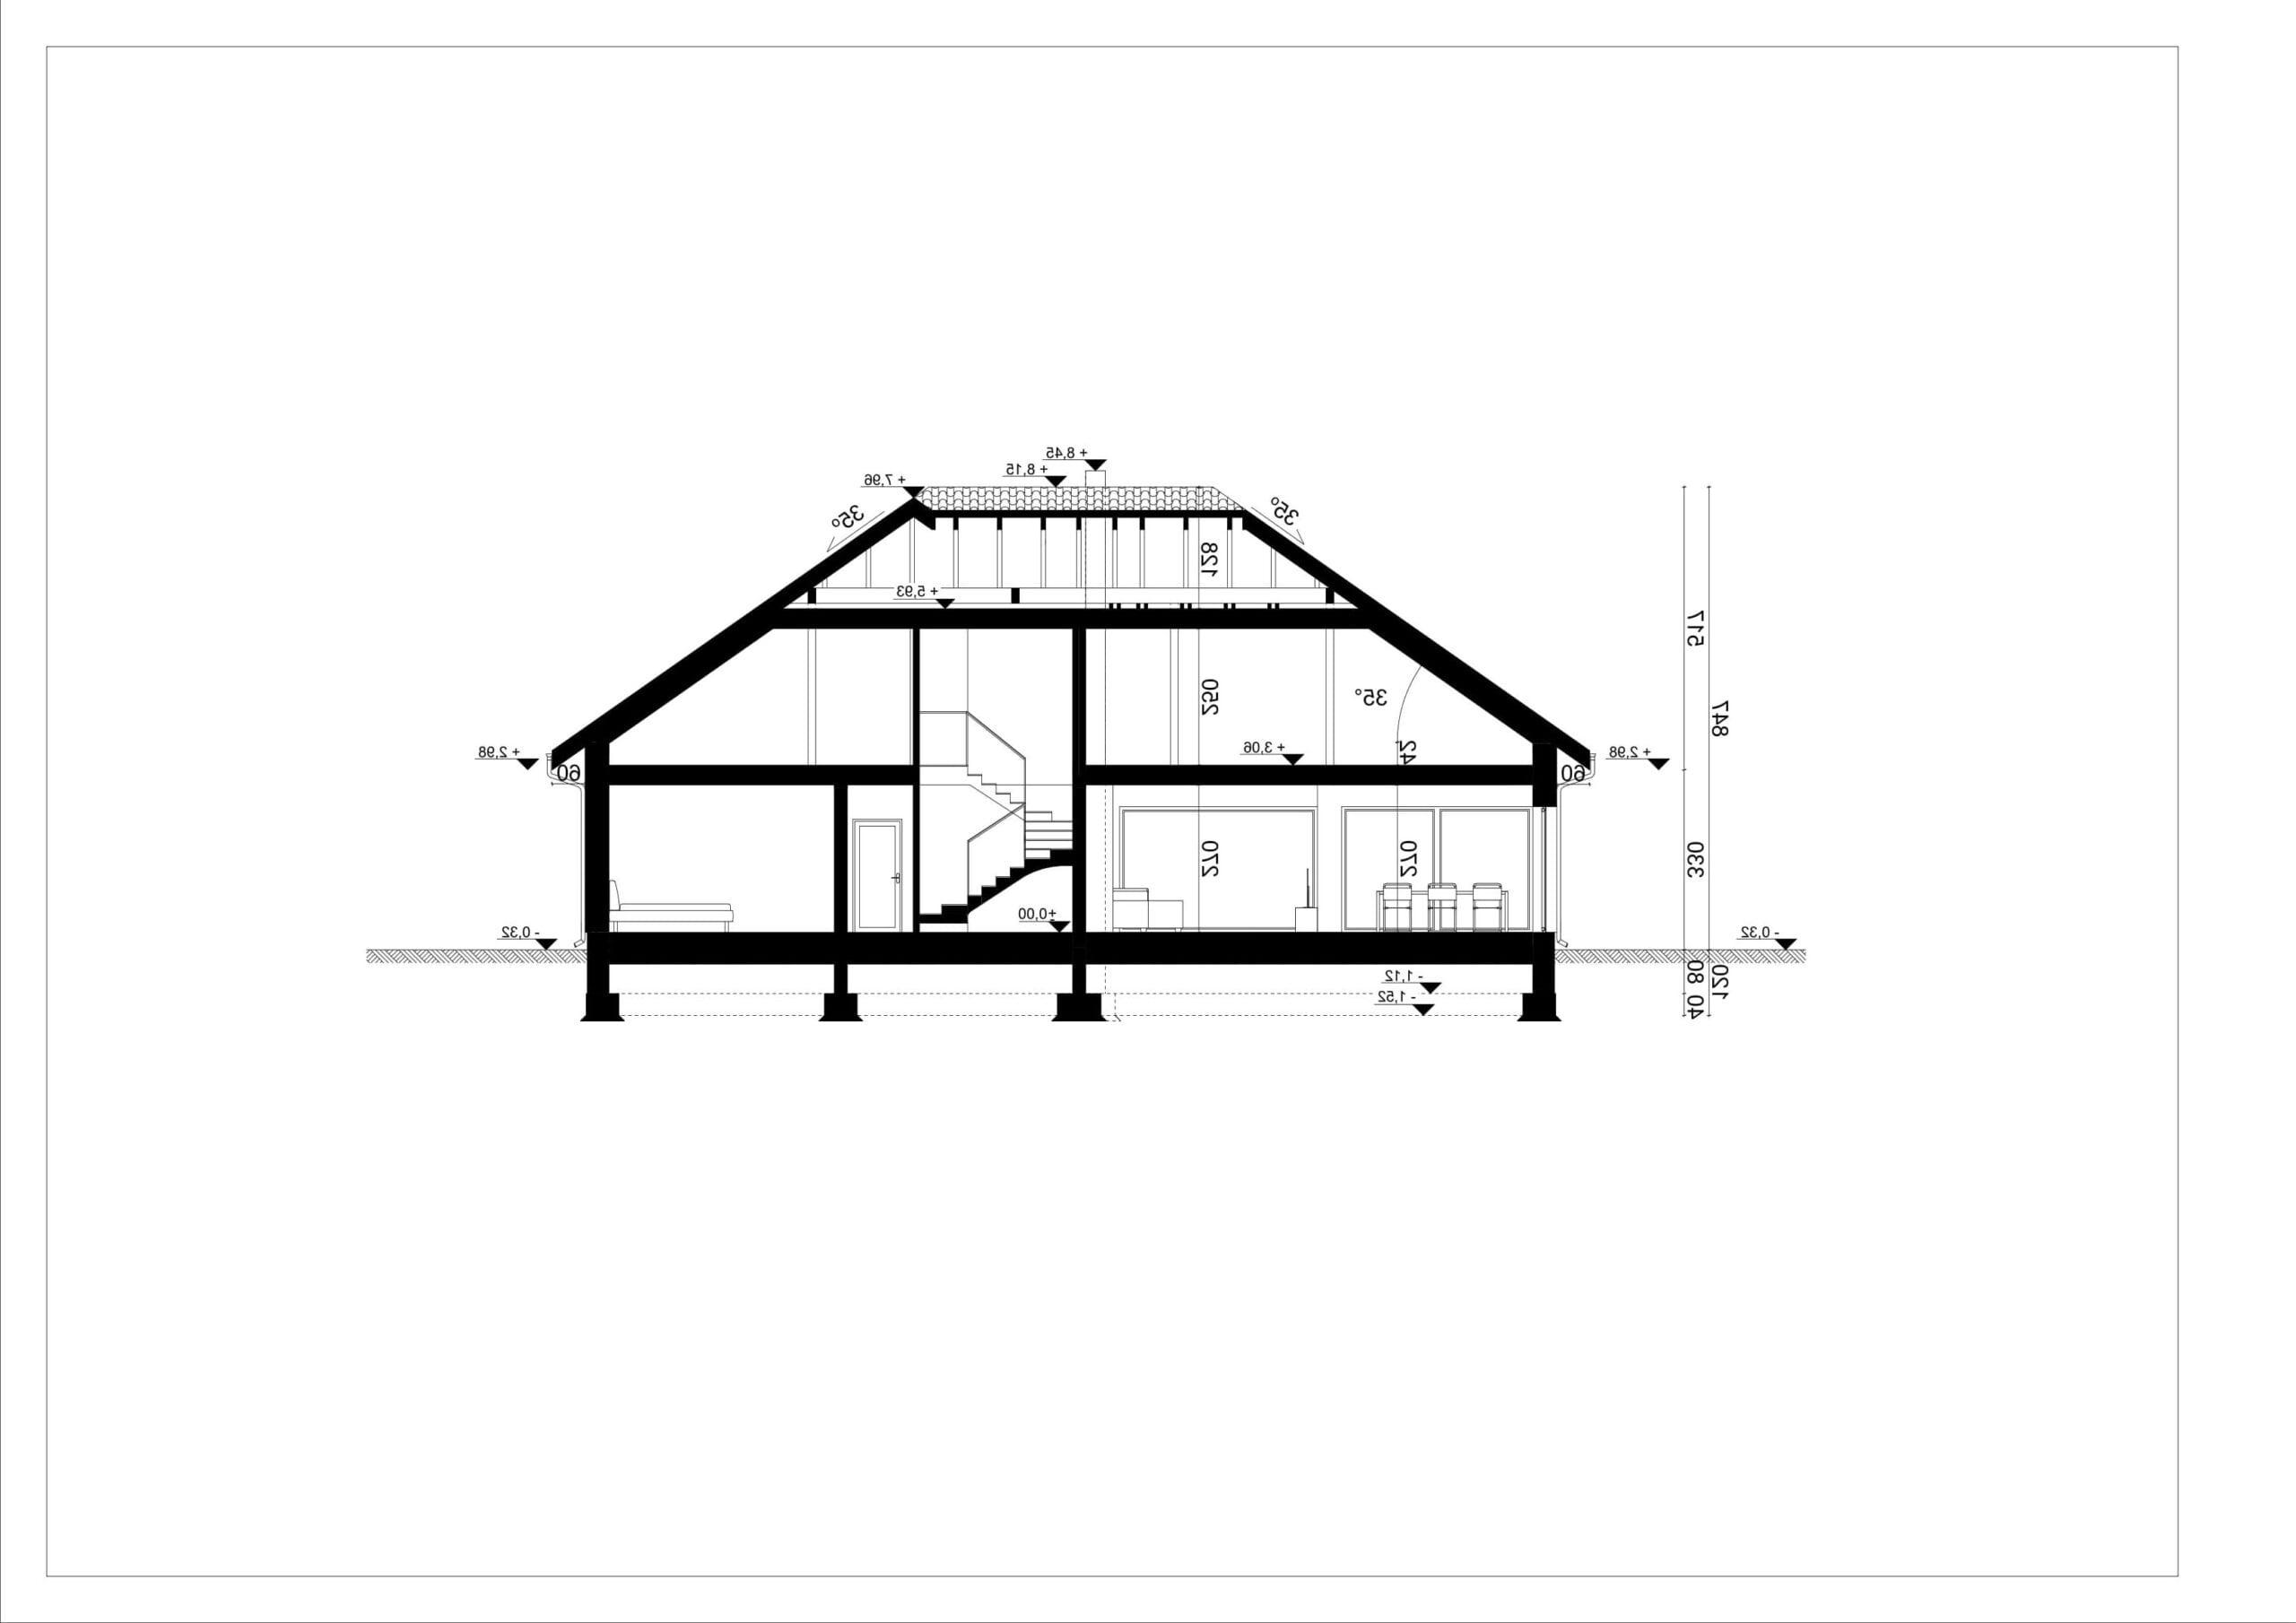 PRZEKRÓJ A-A - projekt domu SEJ-PRO 086 ENERGO - odbicie lustrzane